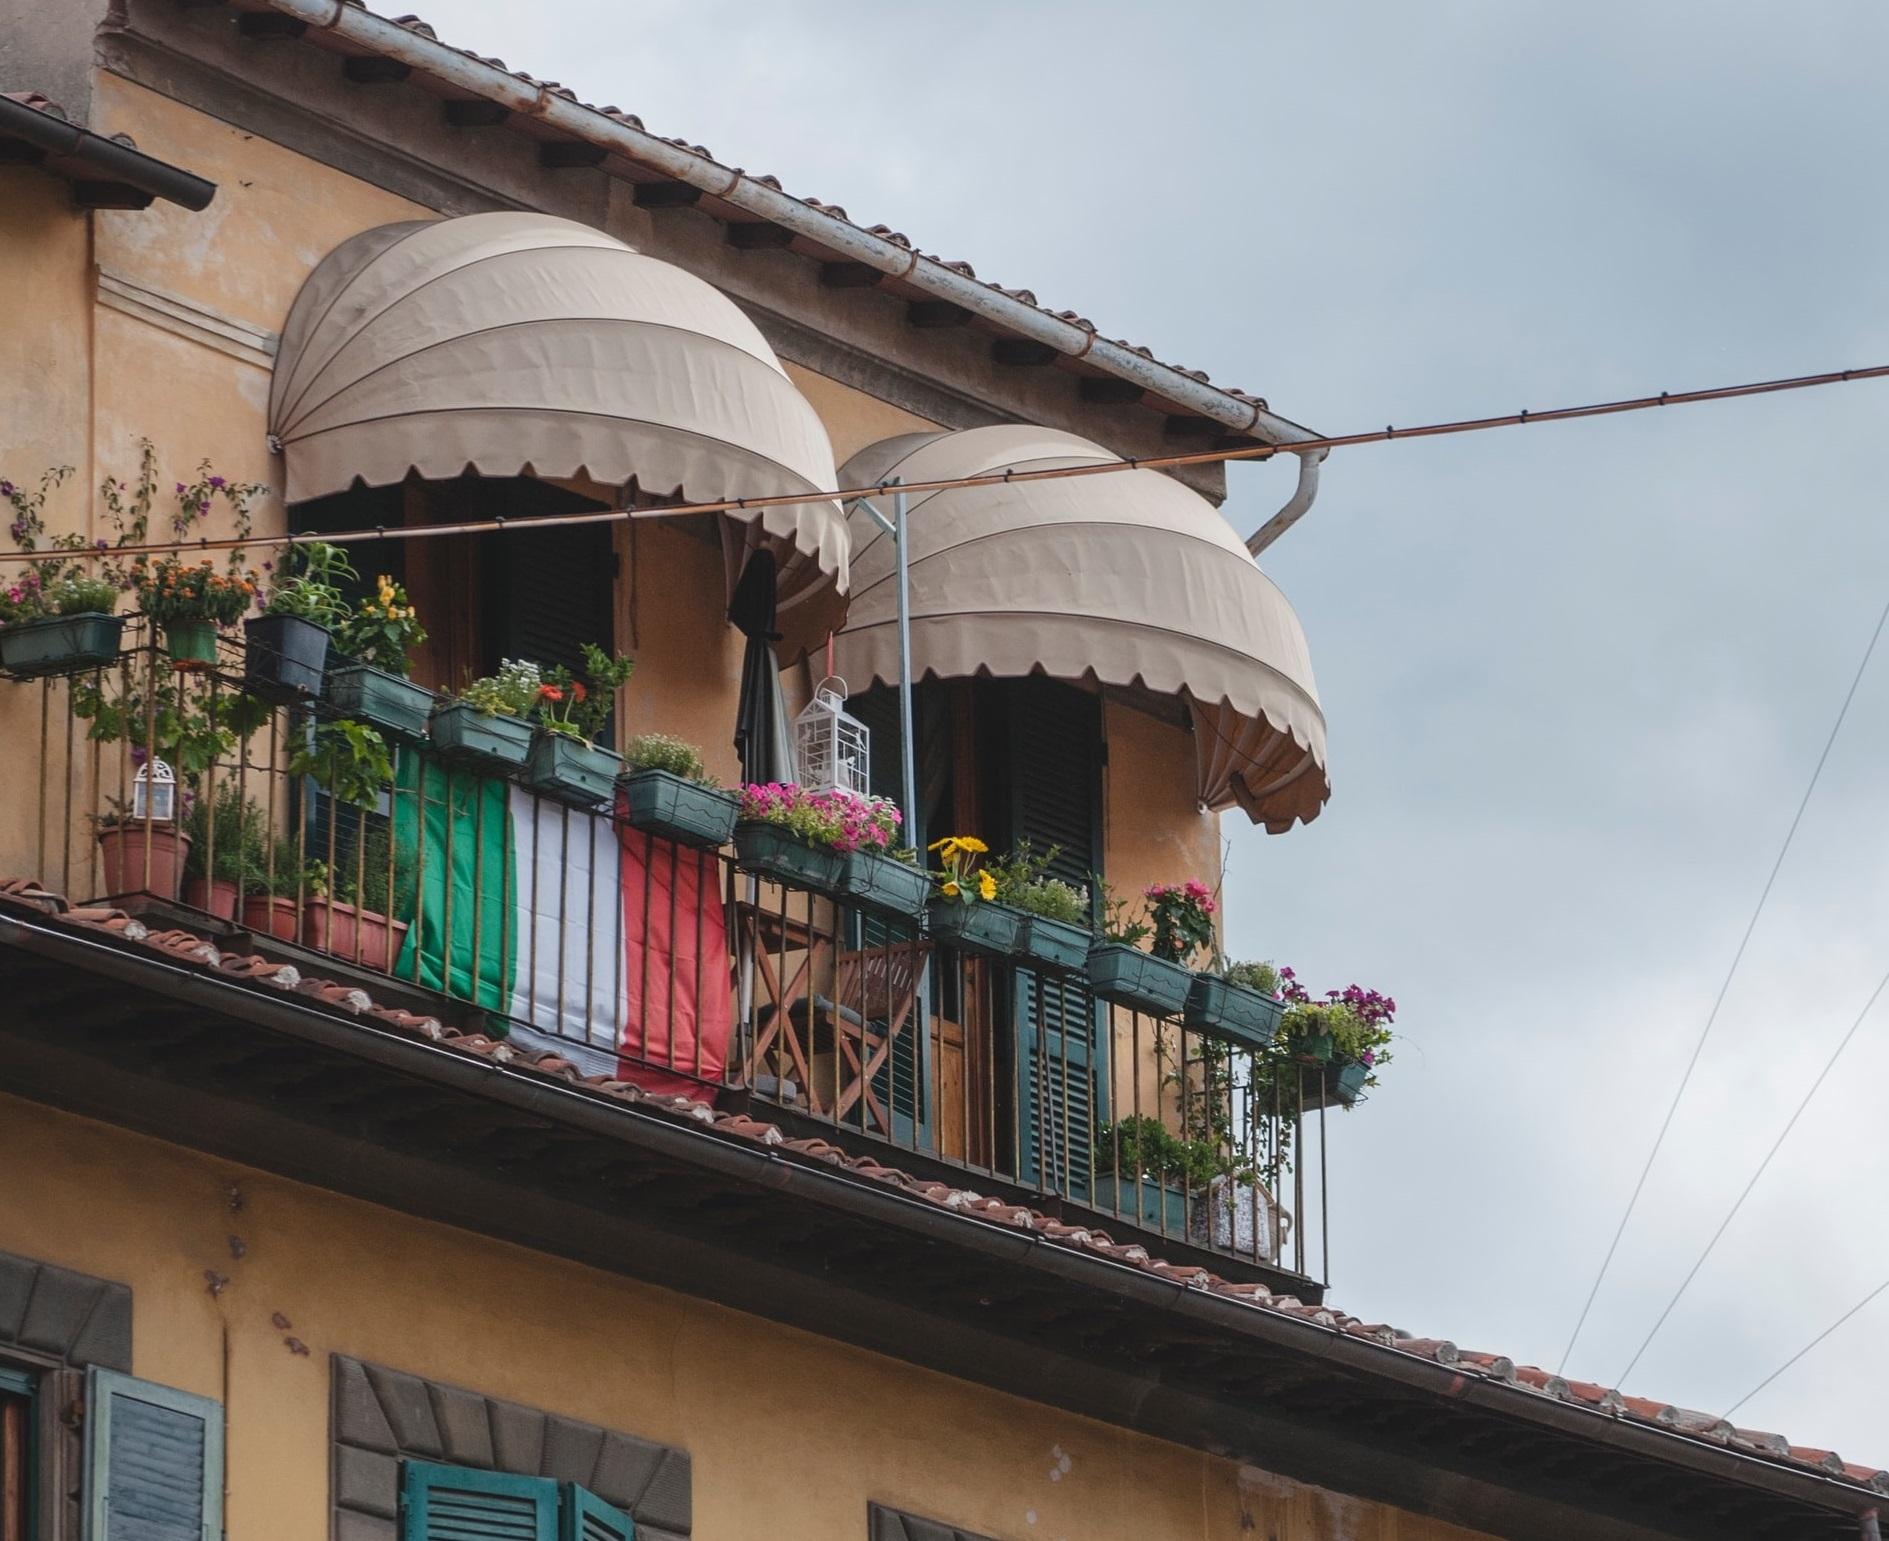 Olasz erkélykoncertek karantén idején